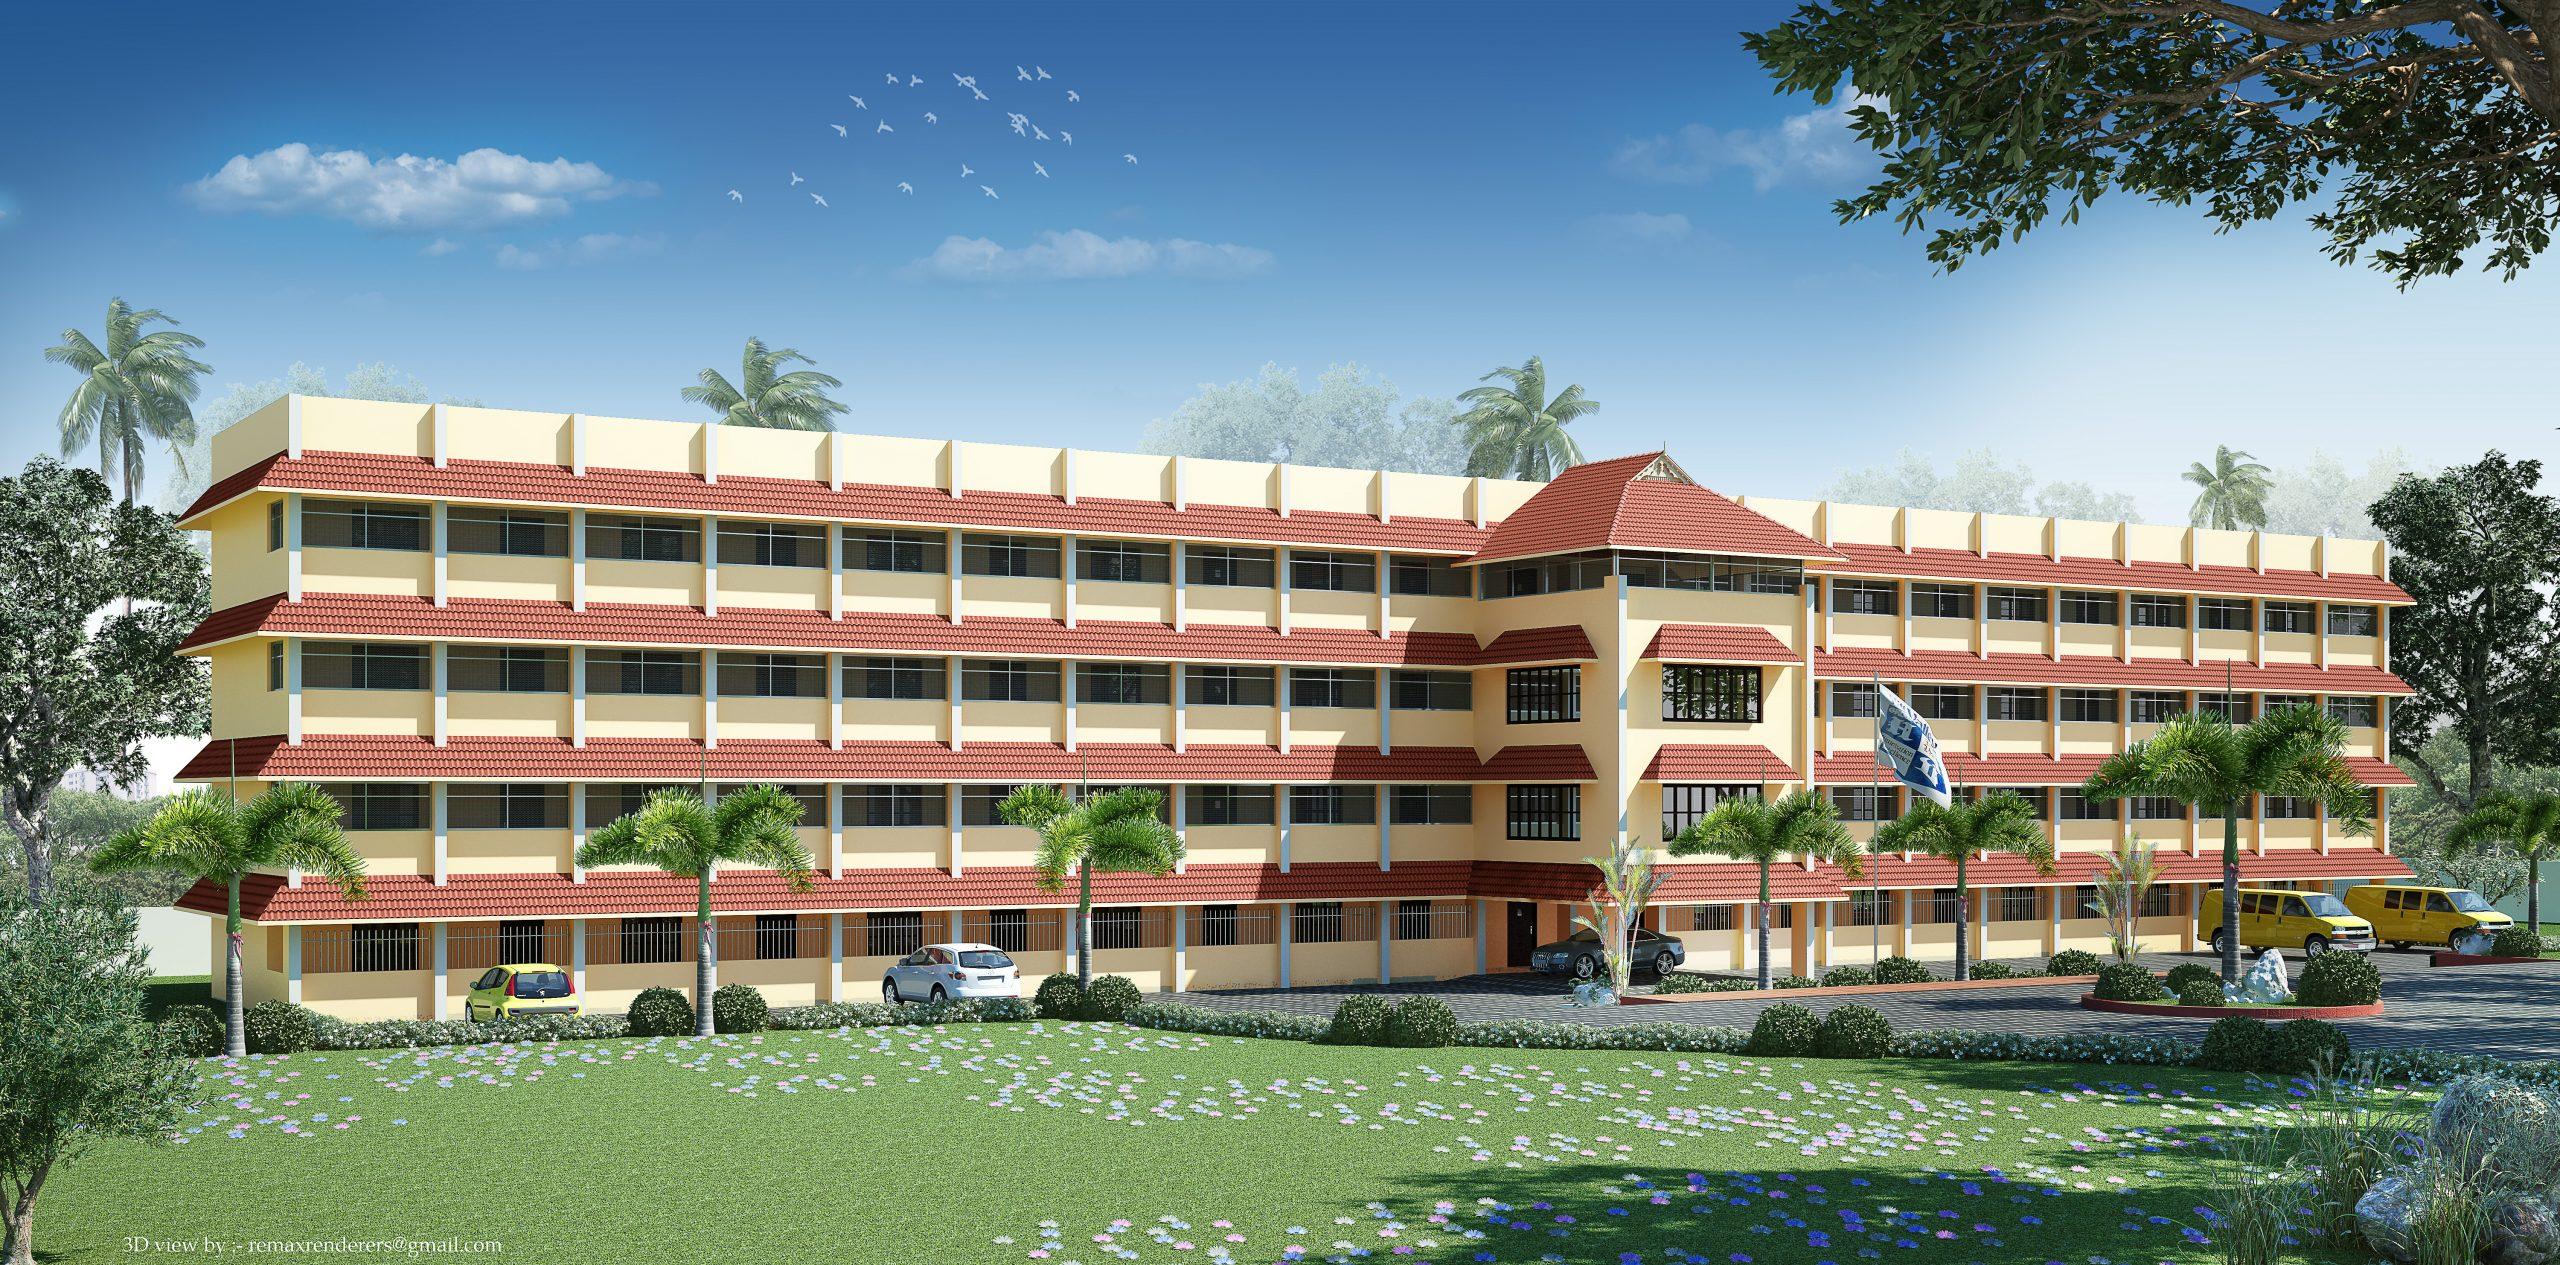 Hill Valey School 01